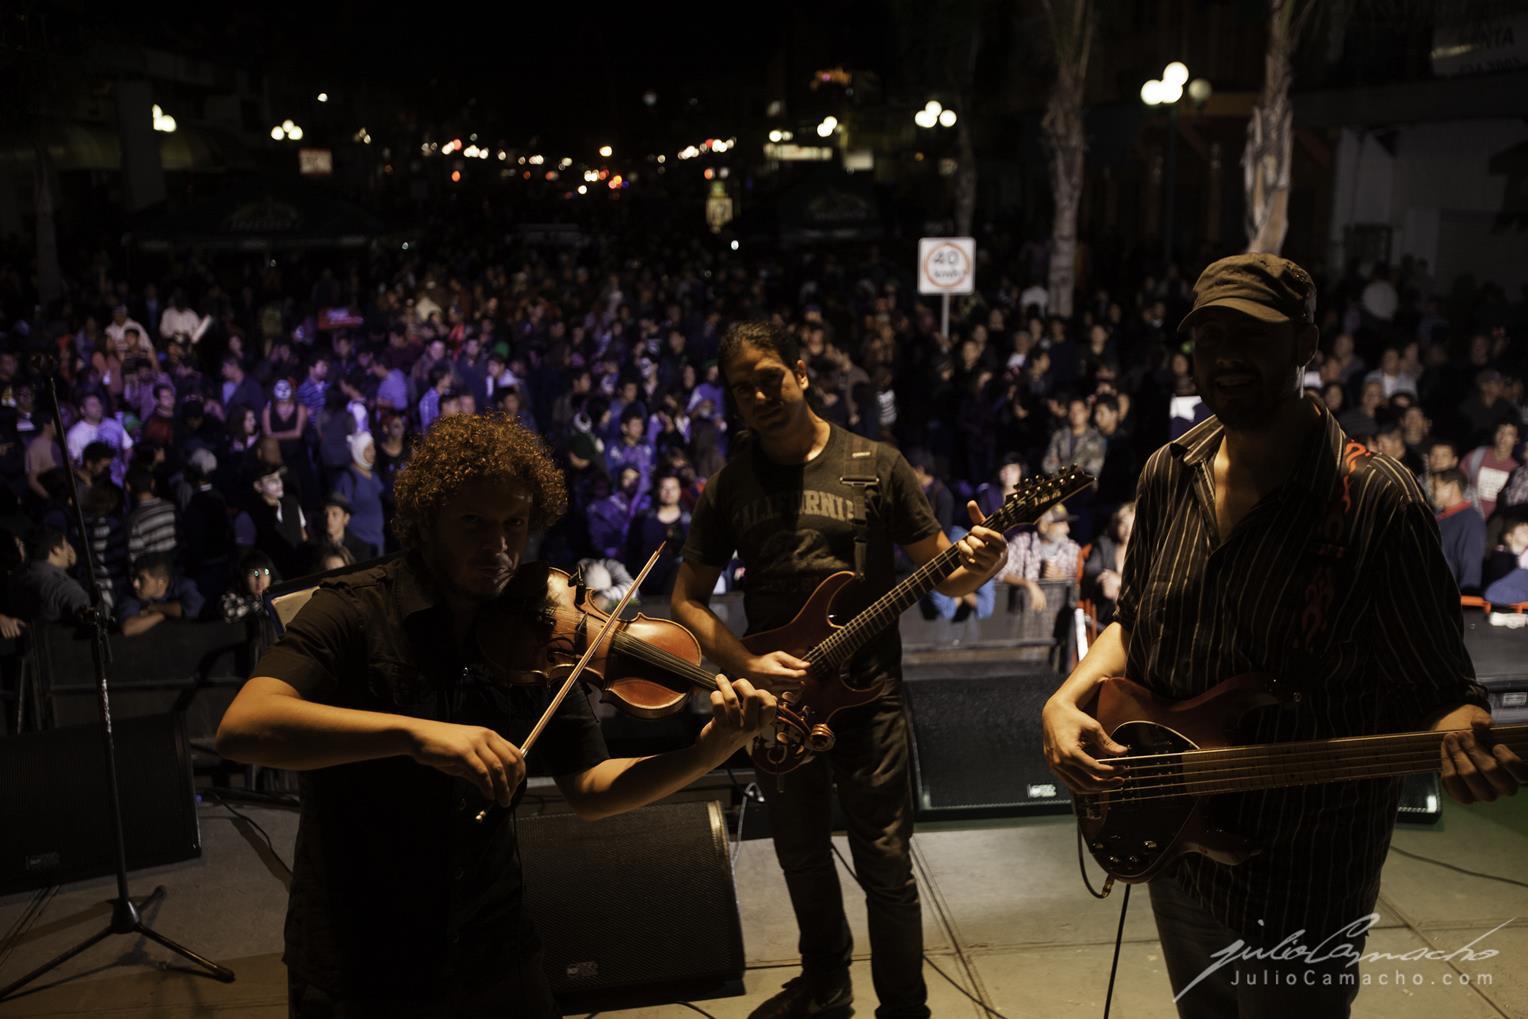 2014-10-30 31 CAST TOUR Ensenada y Tijuana - 1365 - www.Juli (Copy).jpg